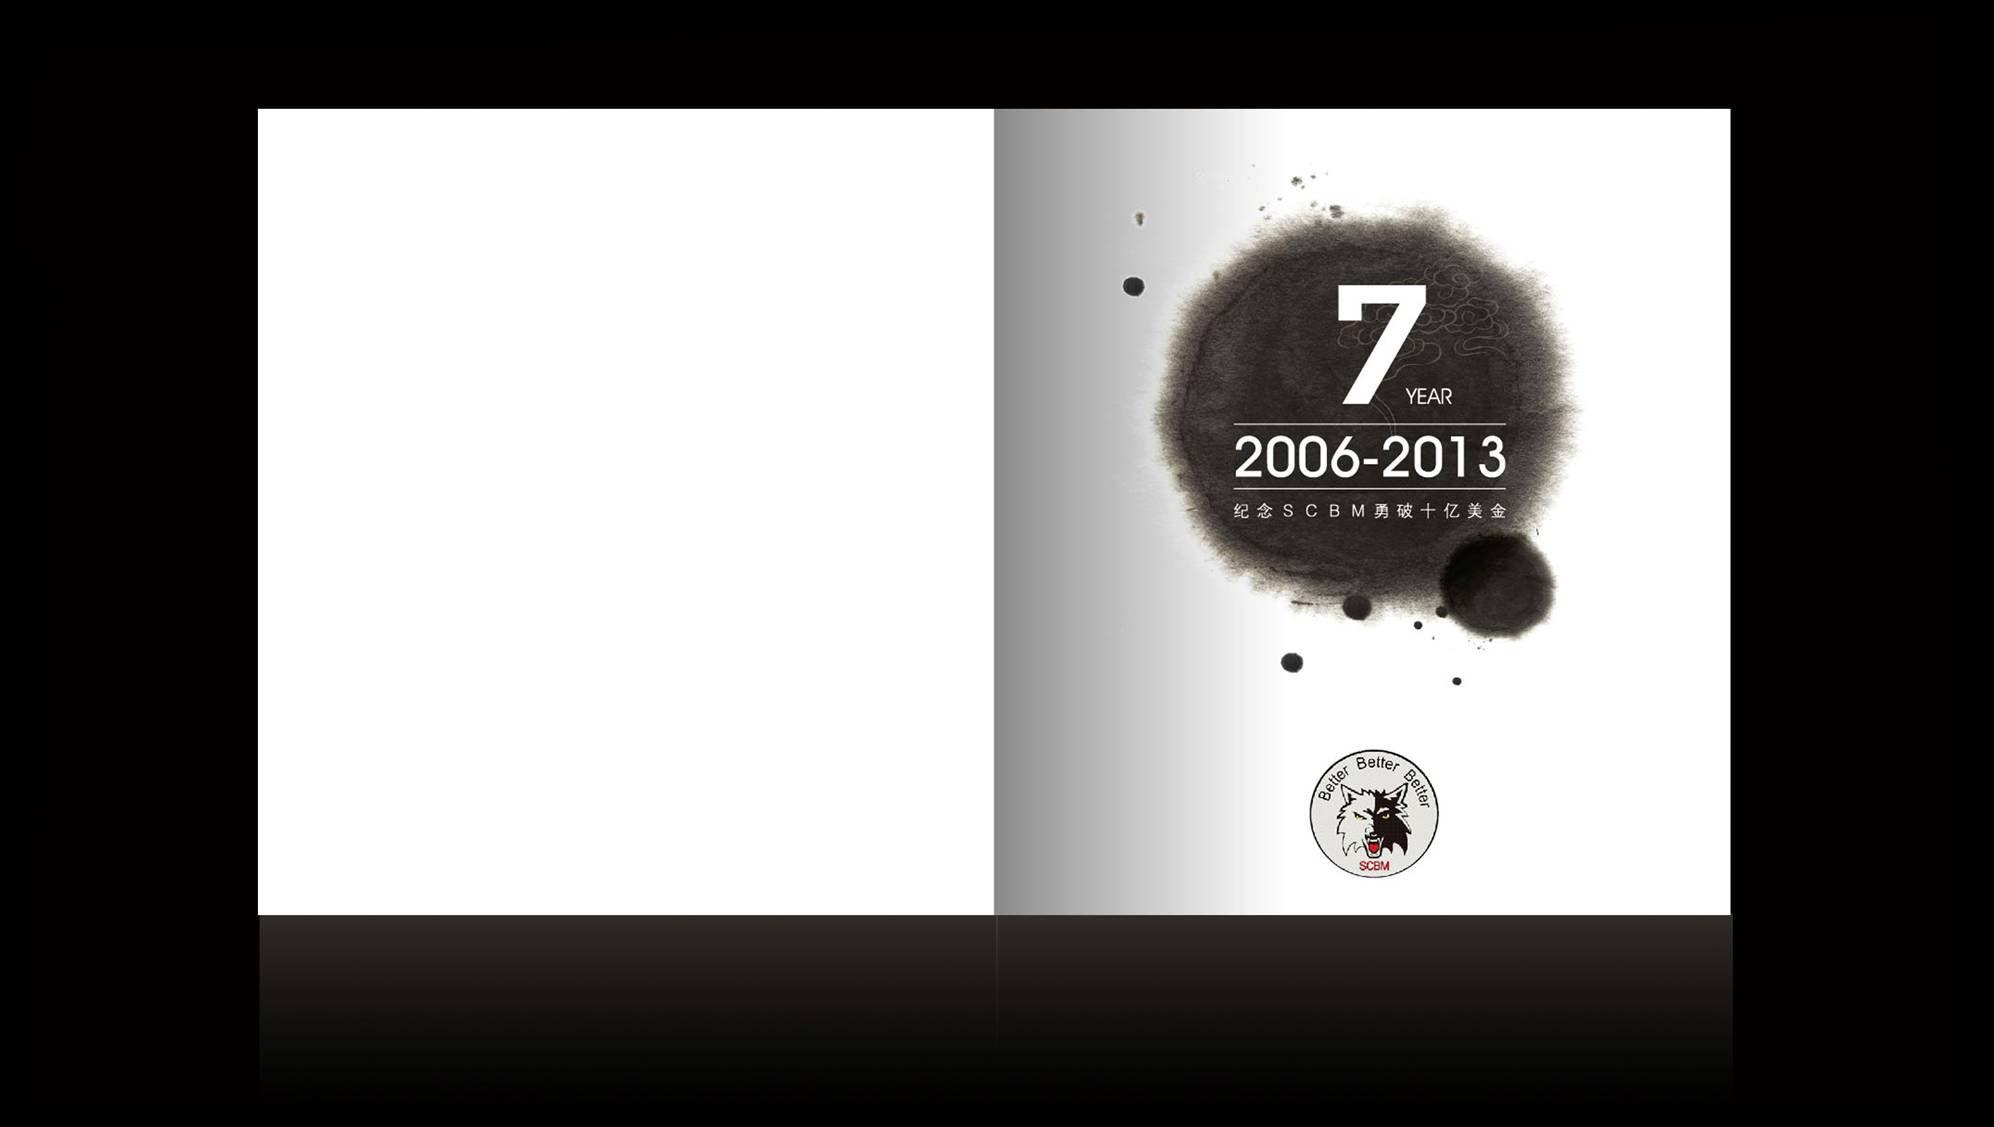 scbm纪念册设计1案例图片图片